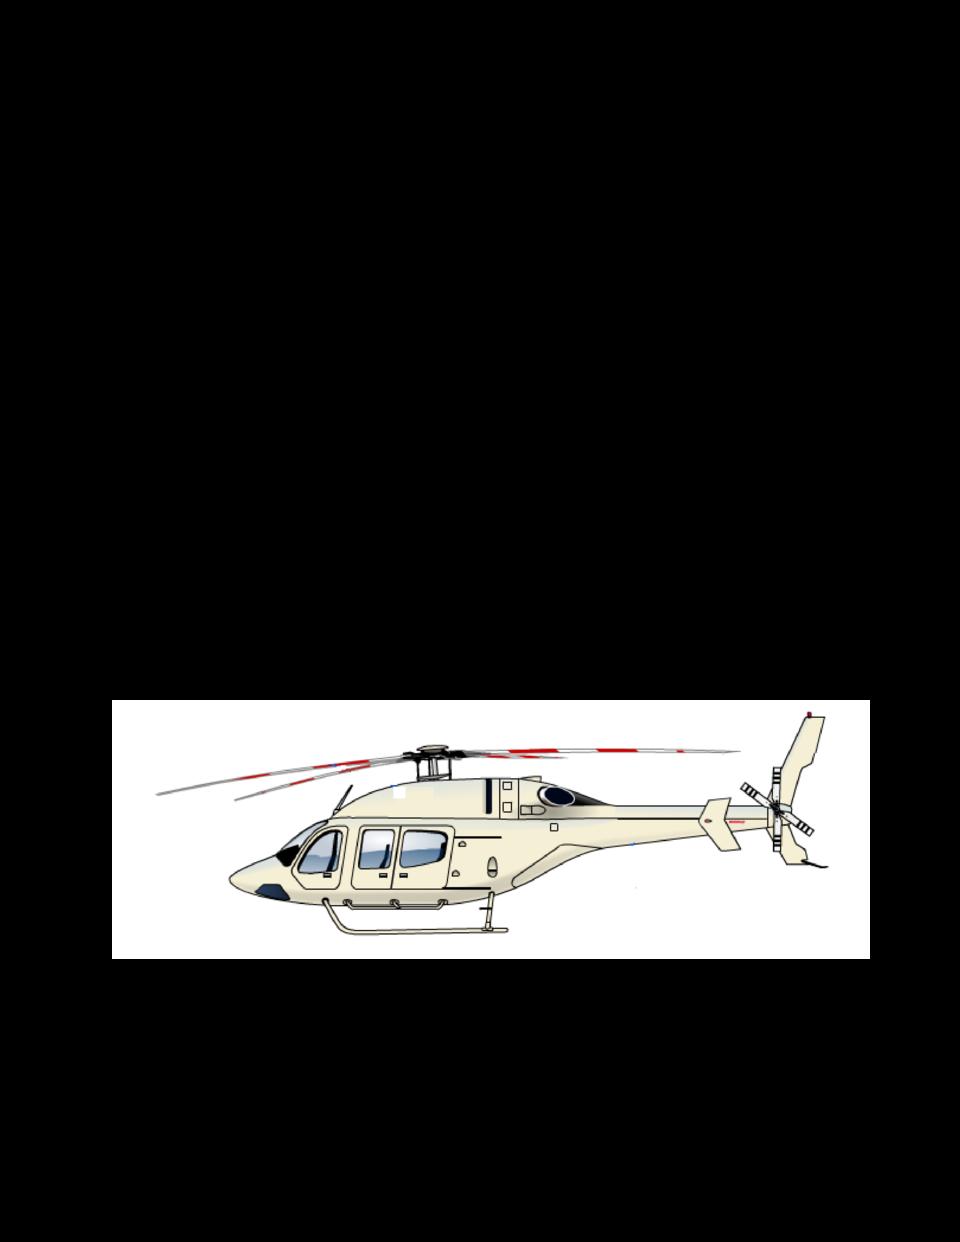 aircomm corporation bell 429 heating system 429h201m1 rev3 user manual rh usermanuals tech Bell 407 Bell 430